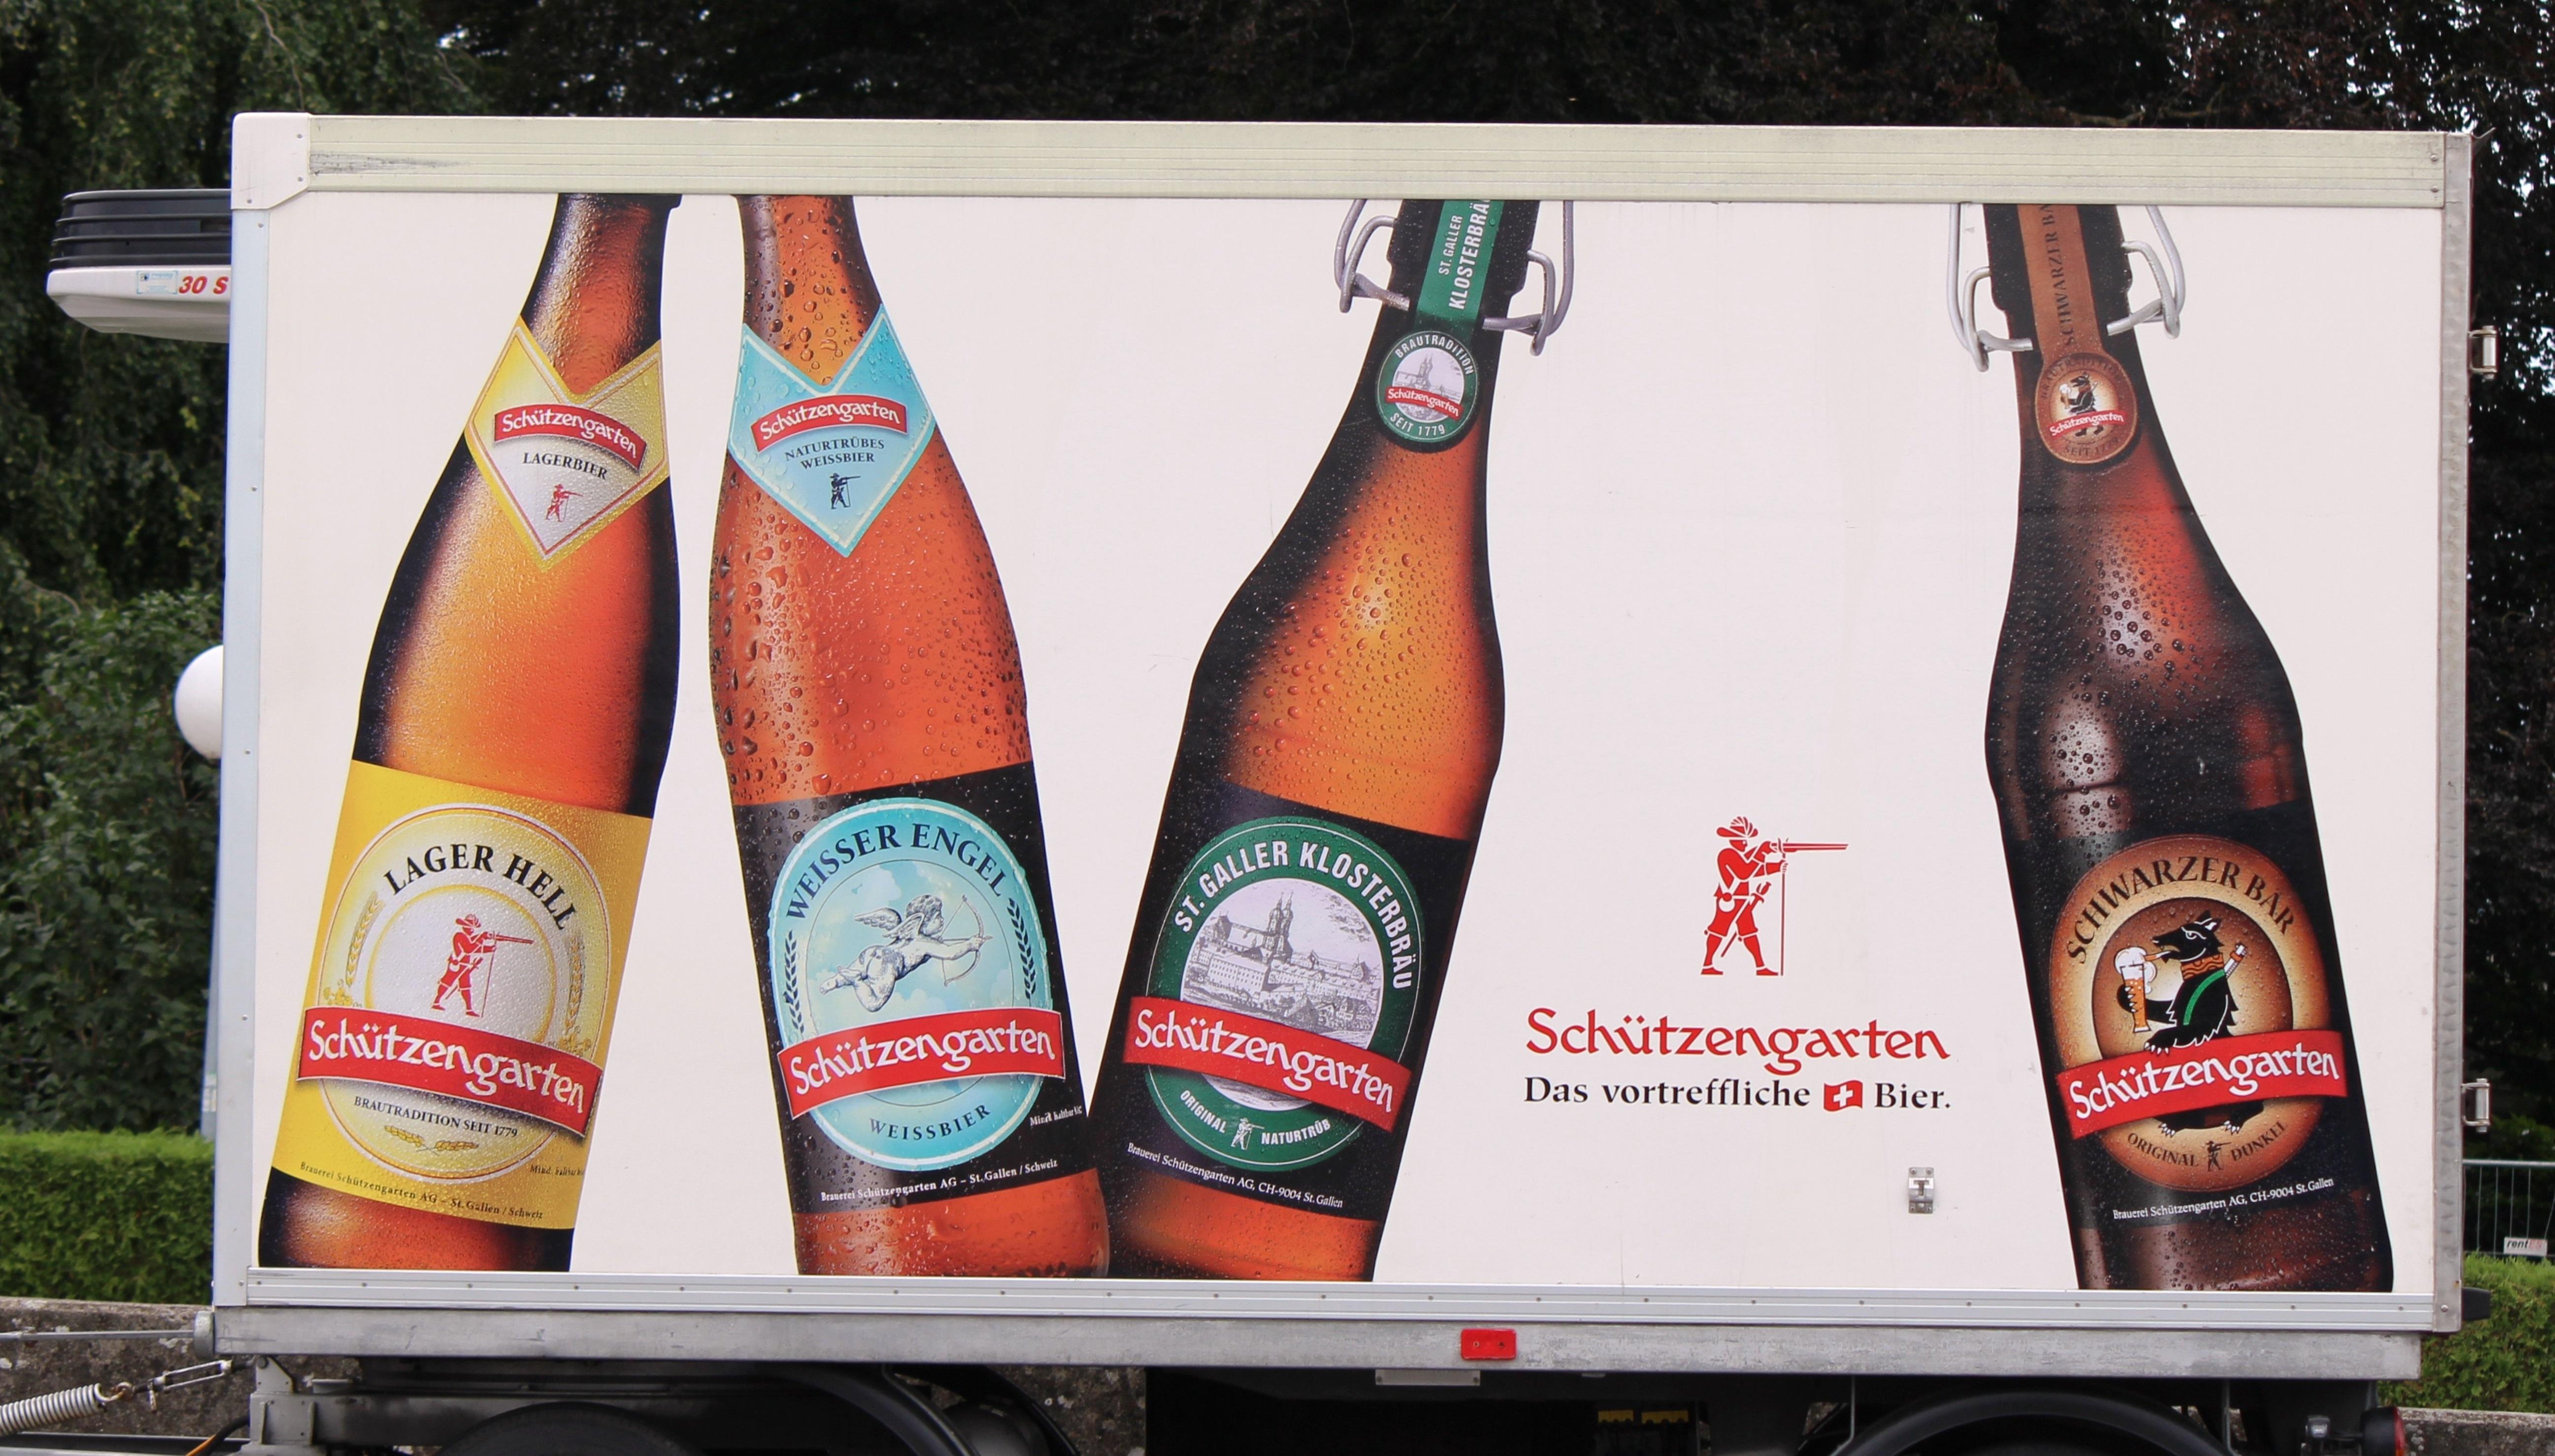 Gambar Iklan Minum Alkohol Poster Botol Bir Trailer